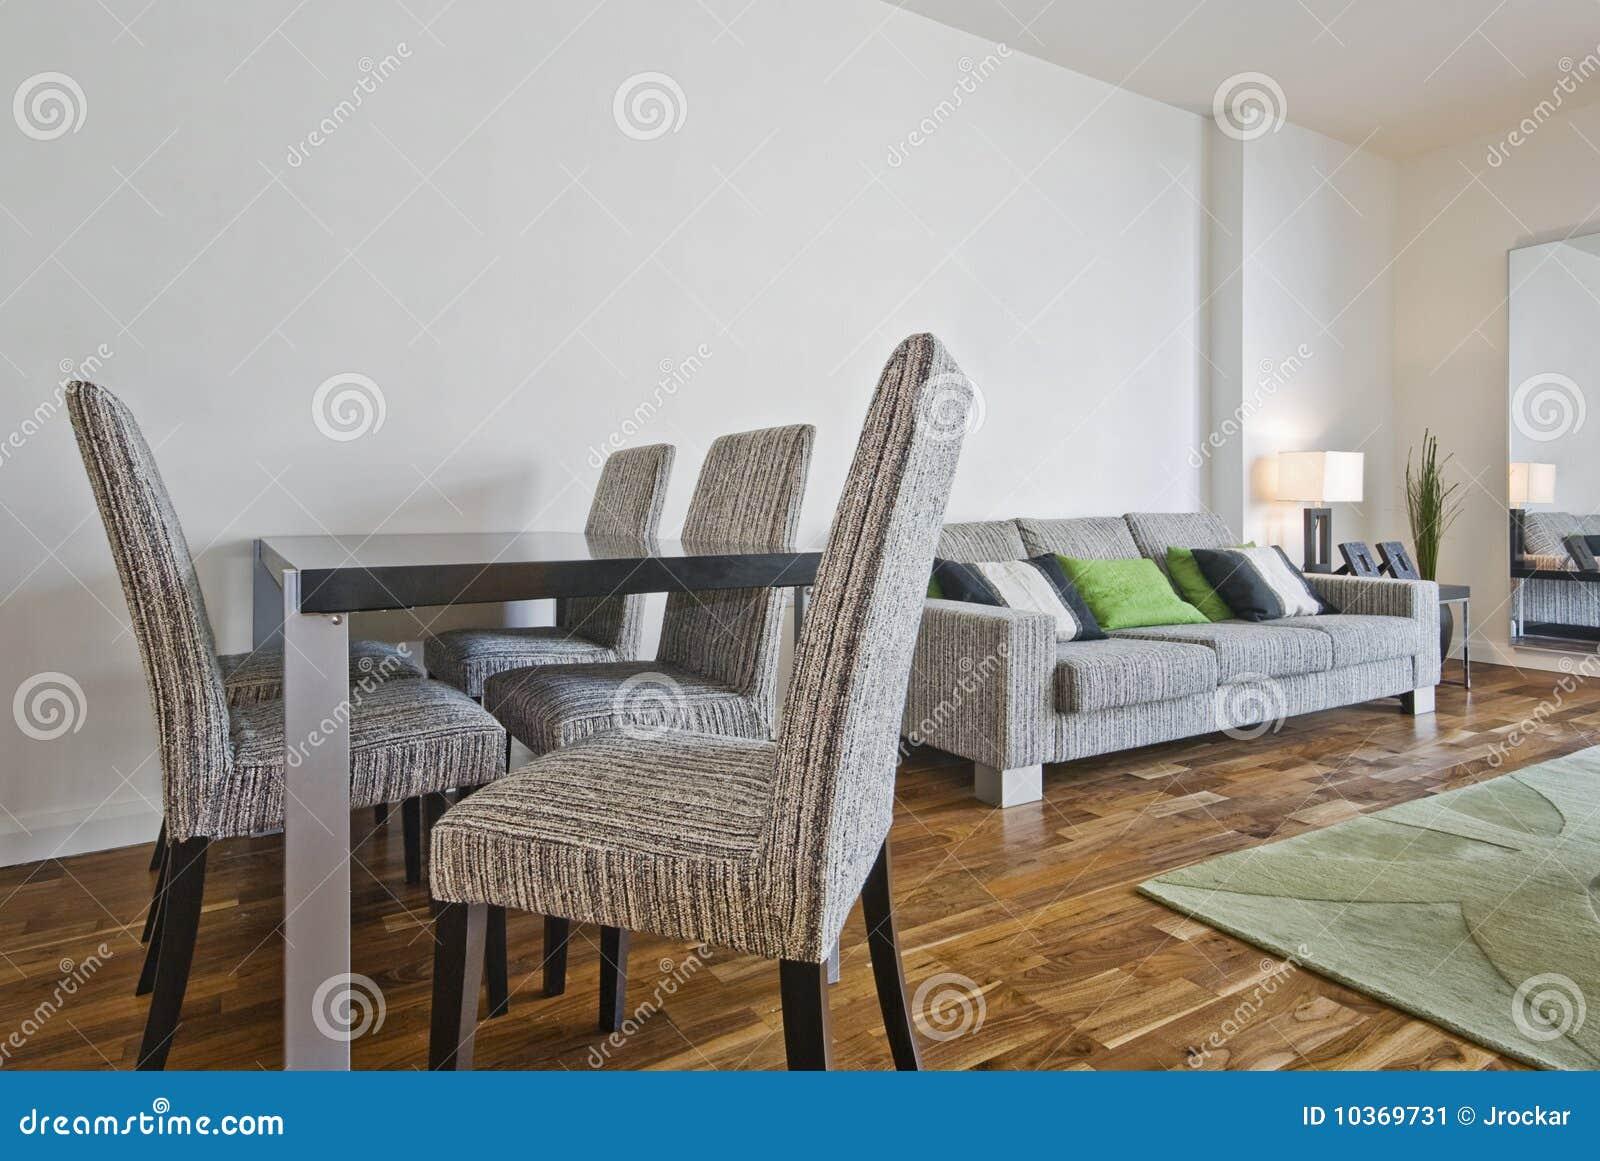 Woonkamer met eettafel stock afbeelding afbeelding 10369731 - Deco moderne woonkamer ...